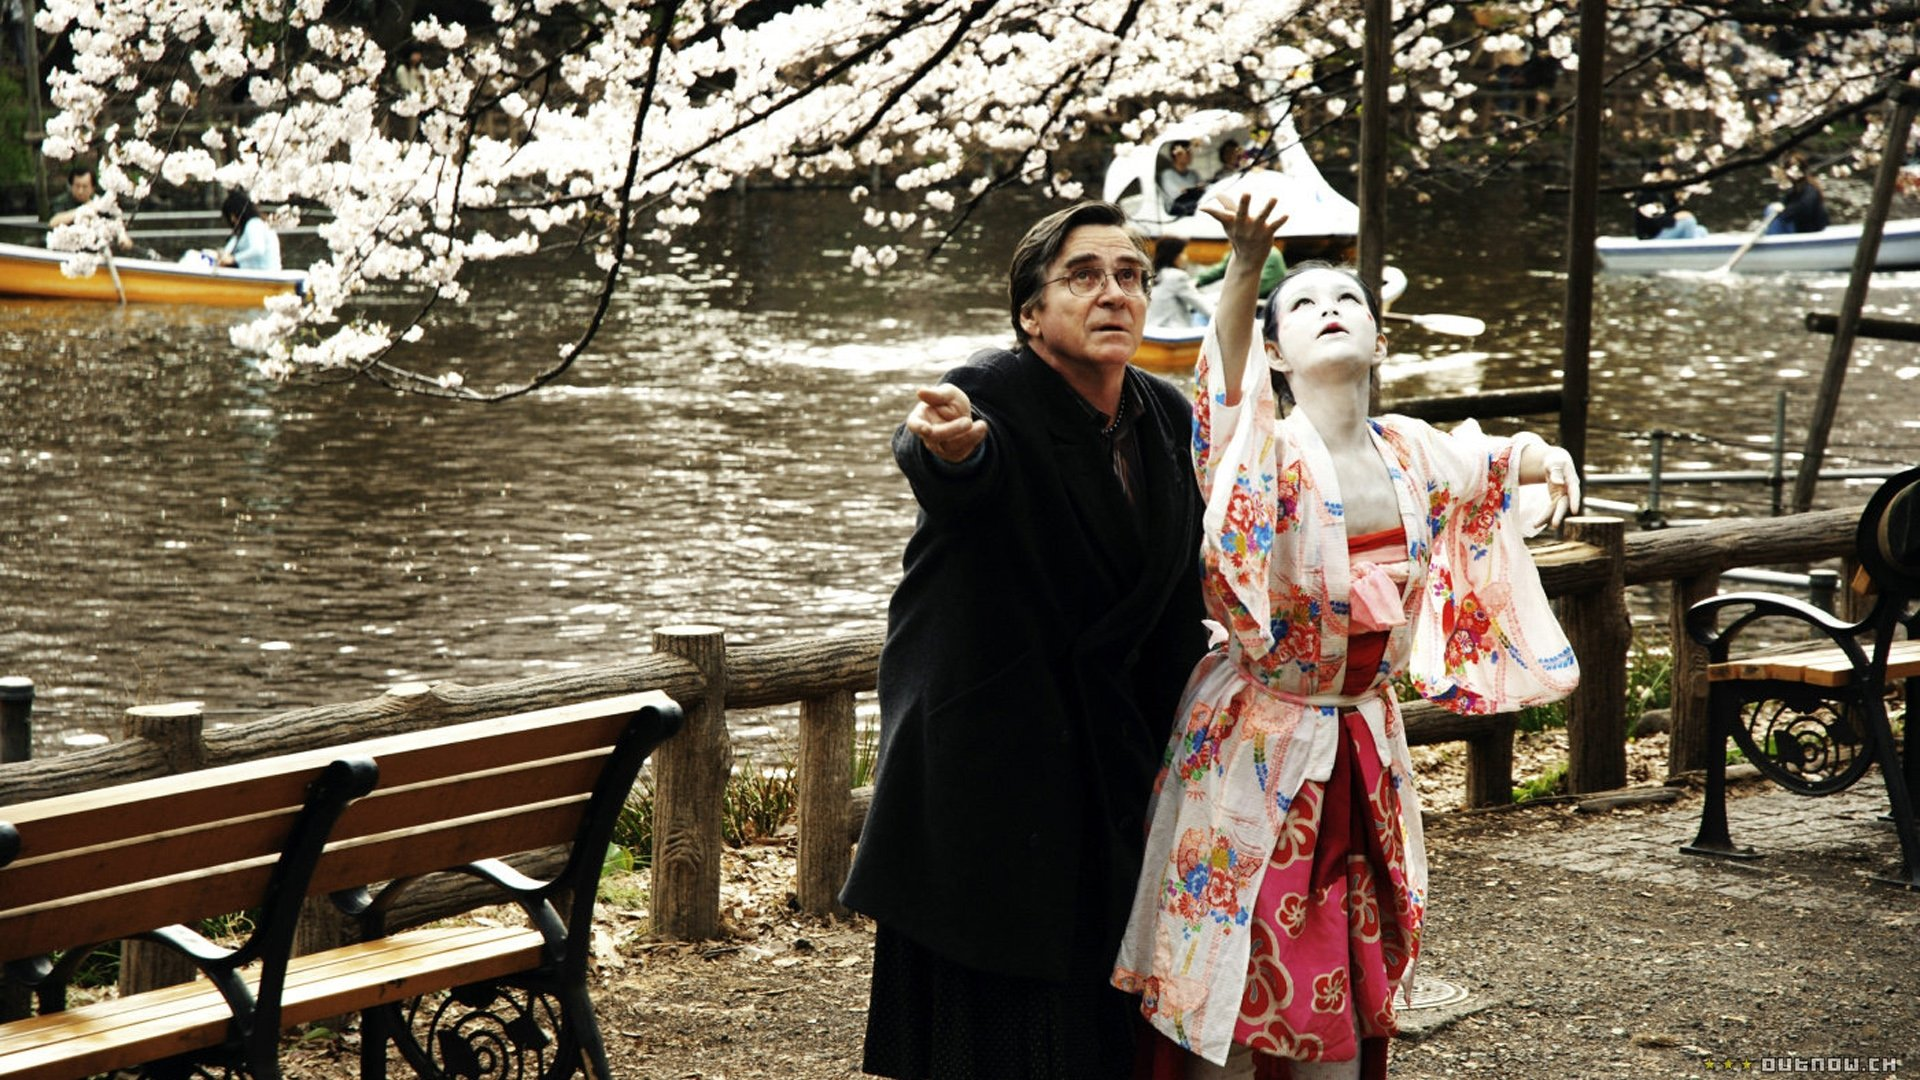 Seattle International Film Festival 2008: Cherry Blossoms: Hanami, Faces, Up the Yangtze, & More